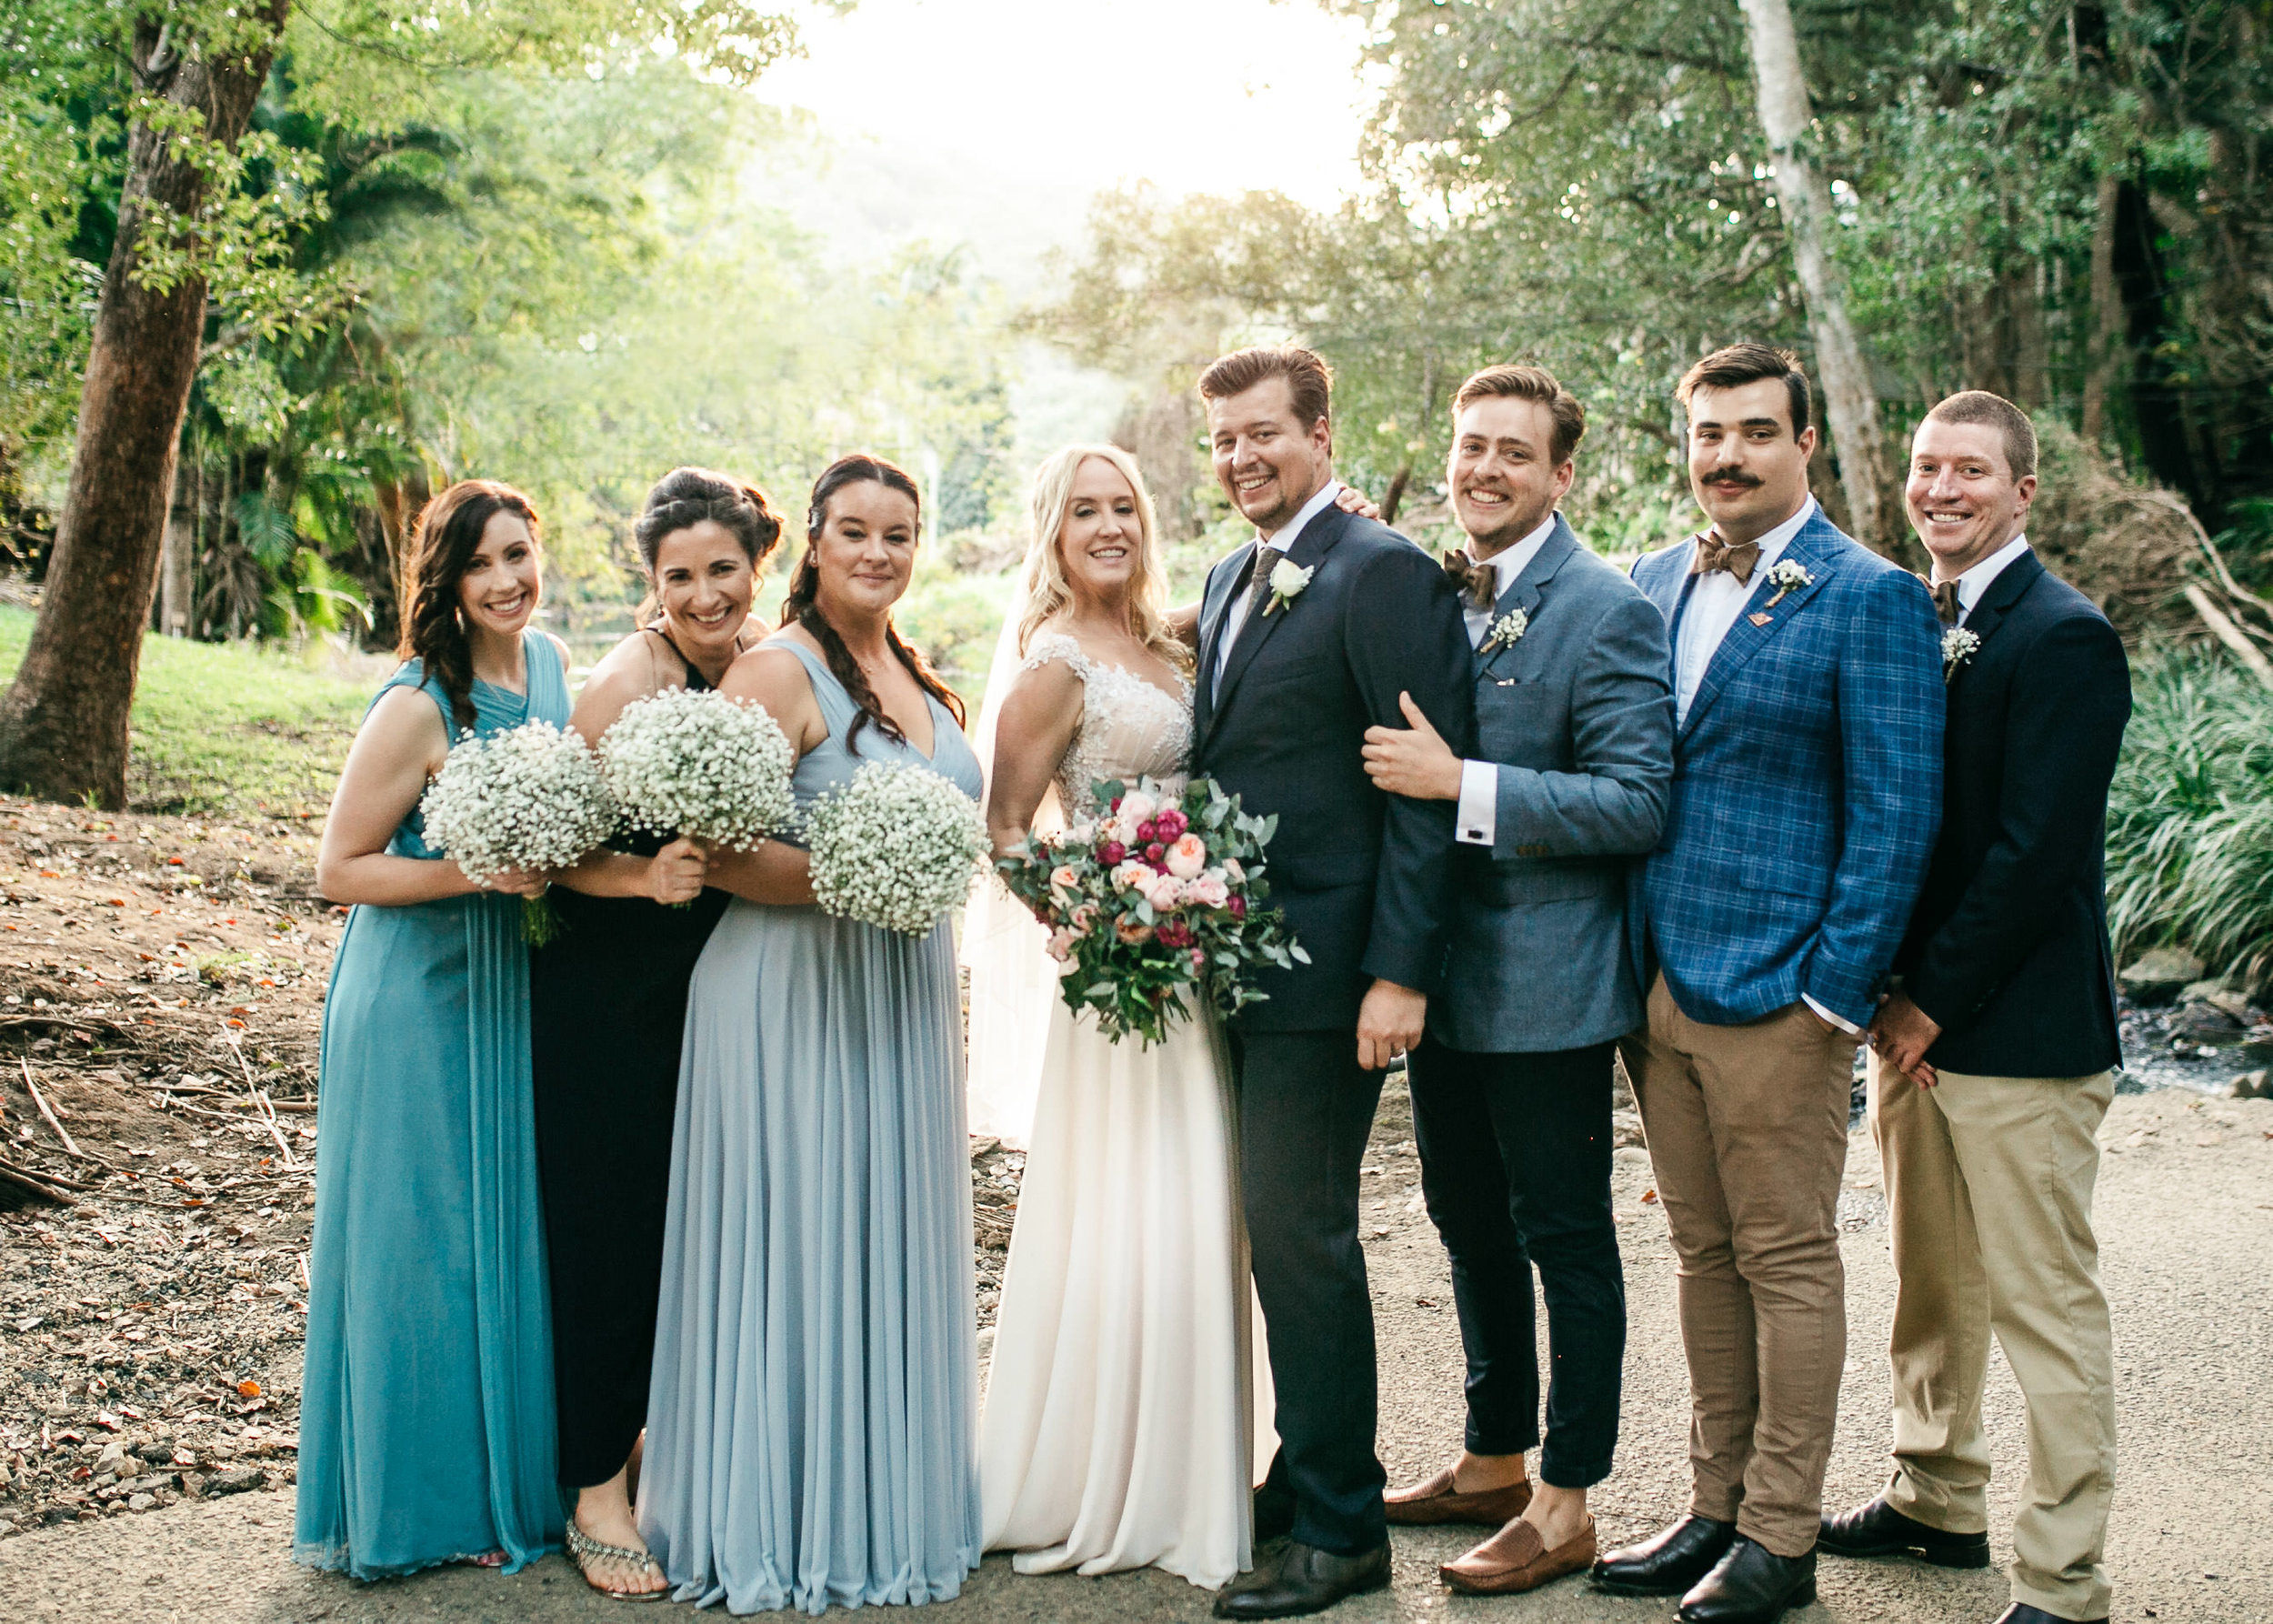 True North Photography_Boomerang Farm_Stacey and Isaac_Gold Coast Wedding_Barm Wedding_Hinterland Wedding-150.jpg